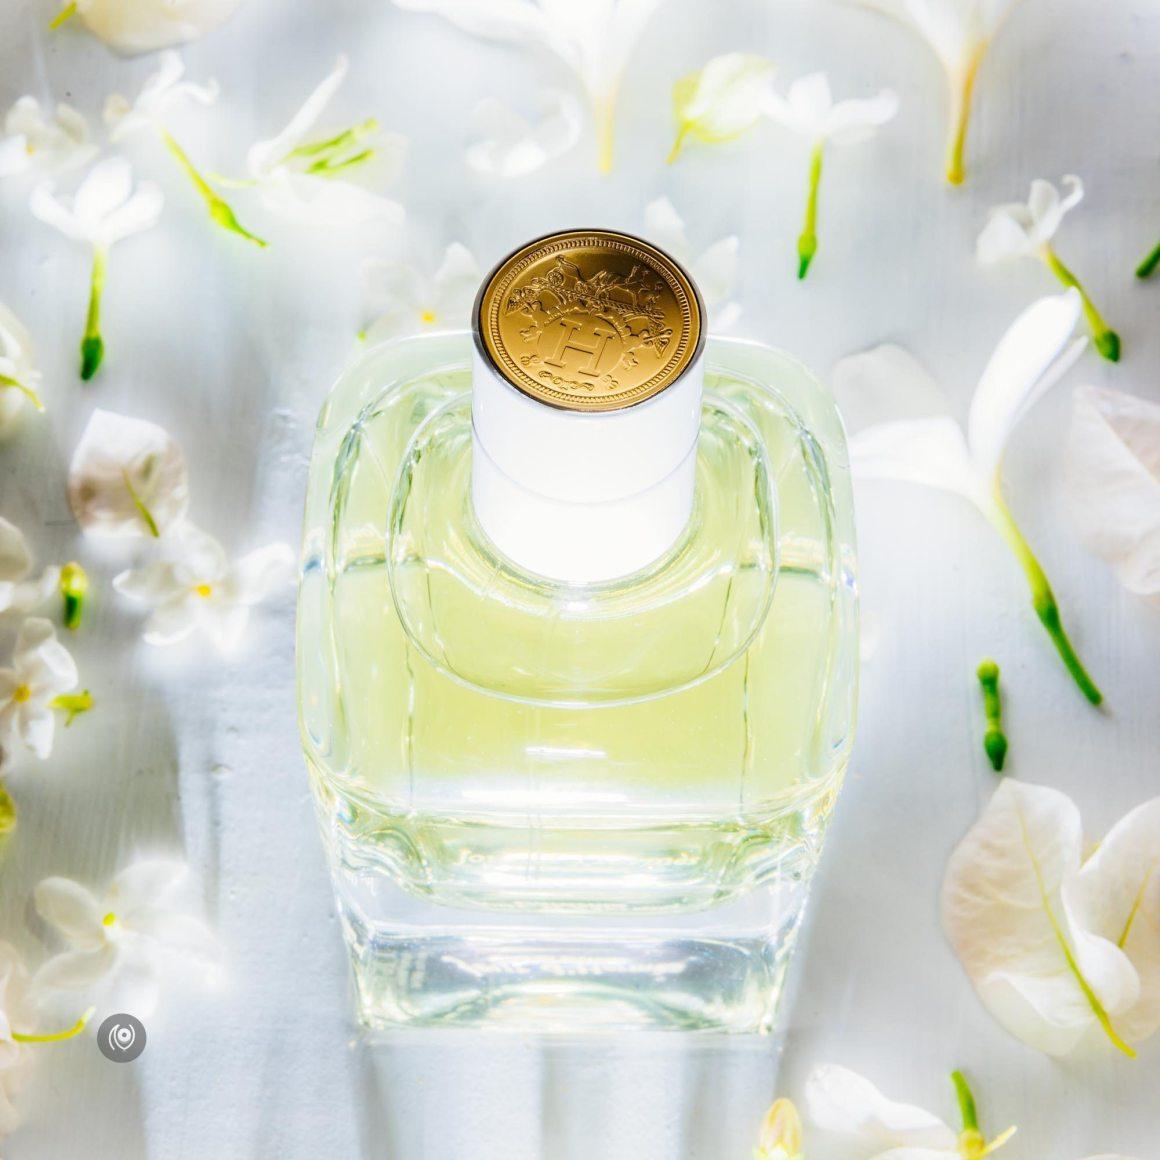 FragranceOfTheMonth-Naina.co-Jour-Hermes-Gardenia-EyesForLuxury-11